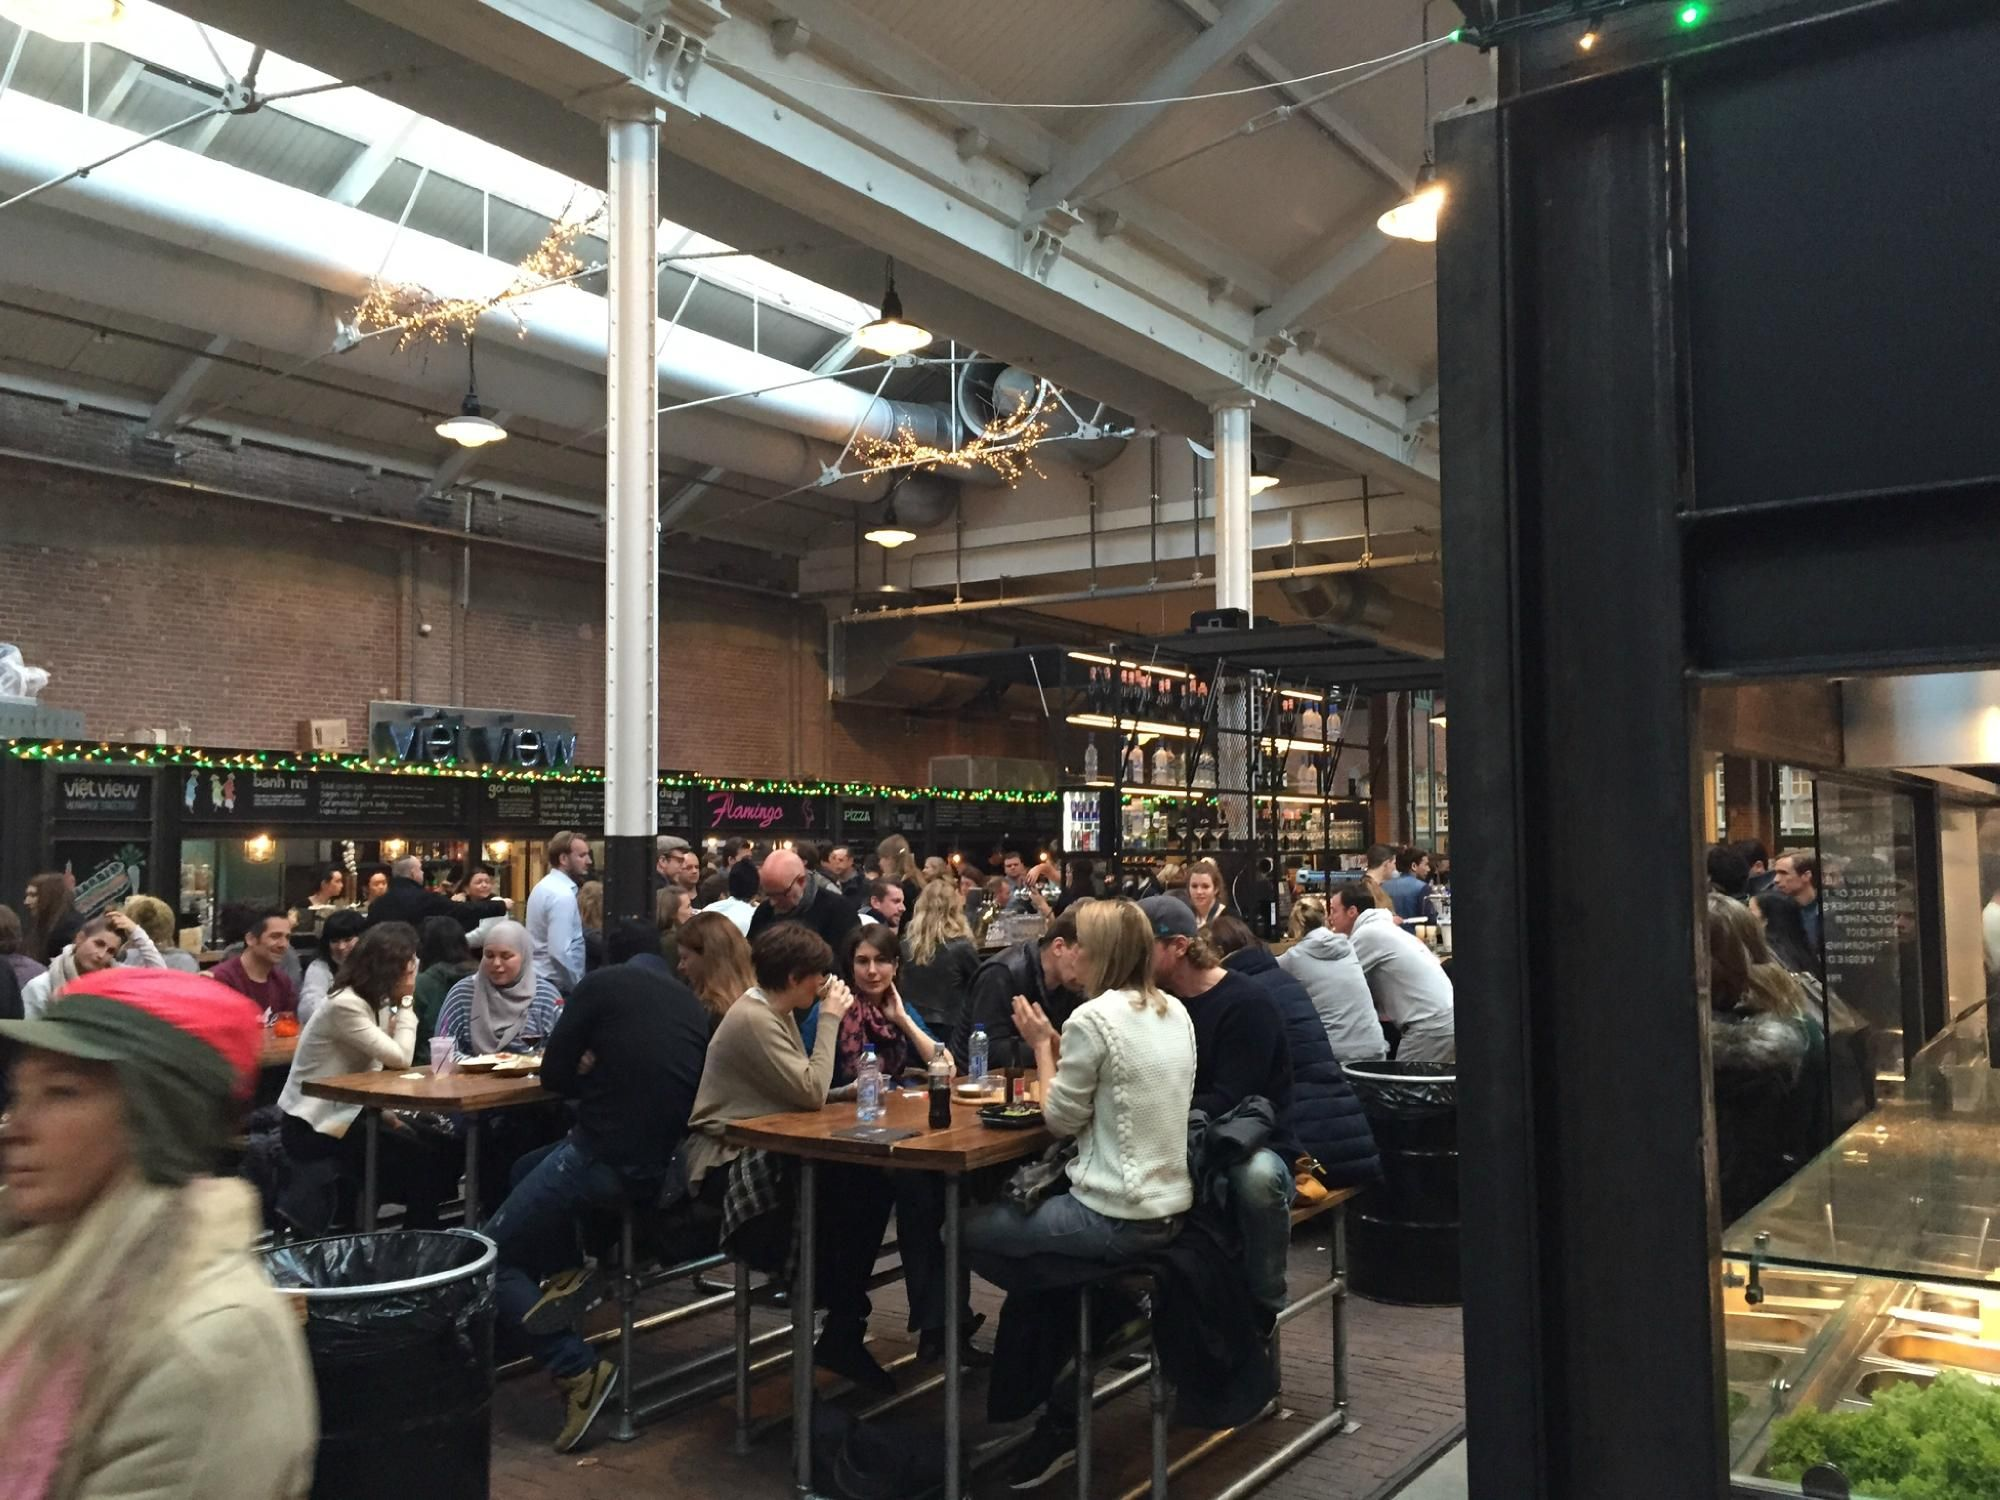 Foodhallen Amsterdam Food Hall Amsterdam Con Immagini